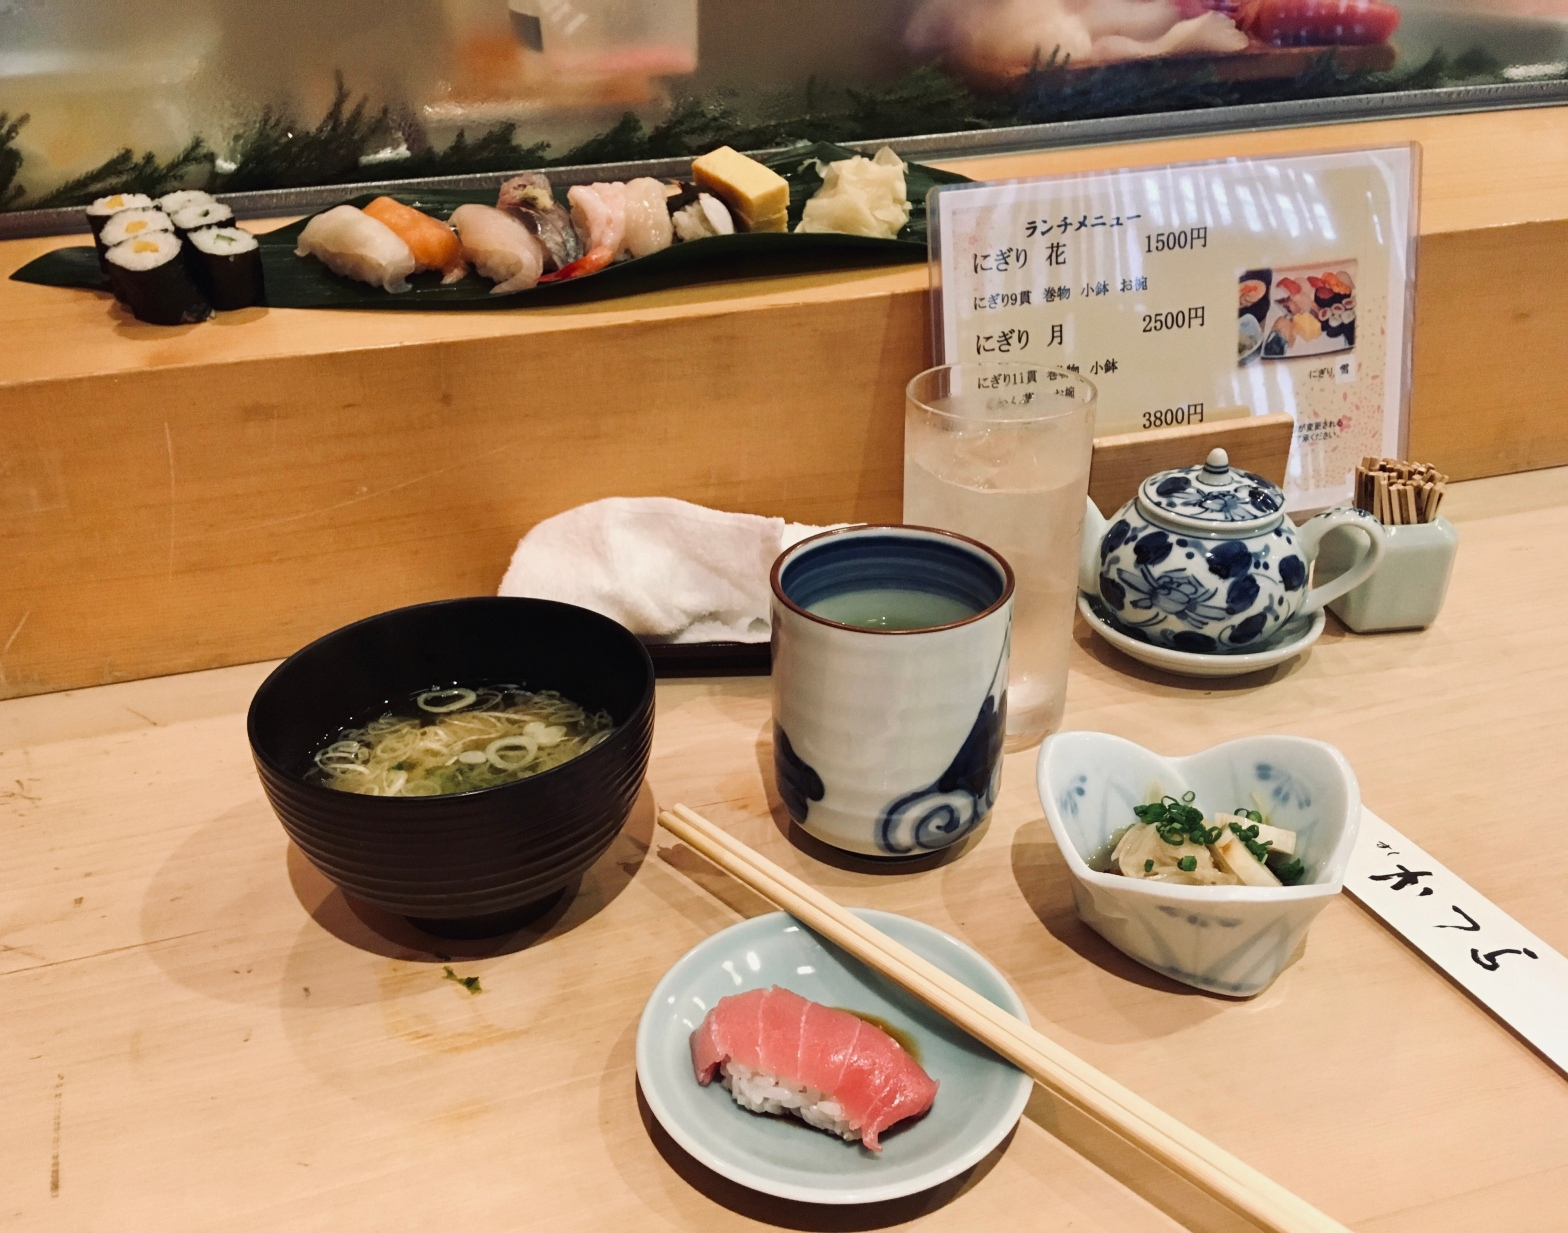 Inside Sushi Katsura restaurant in Tokyo